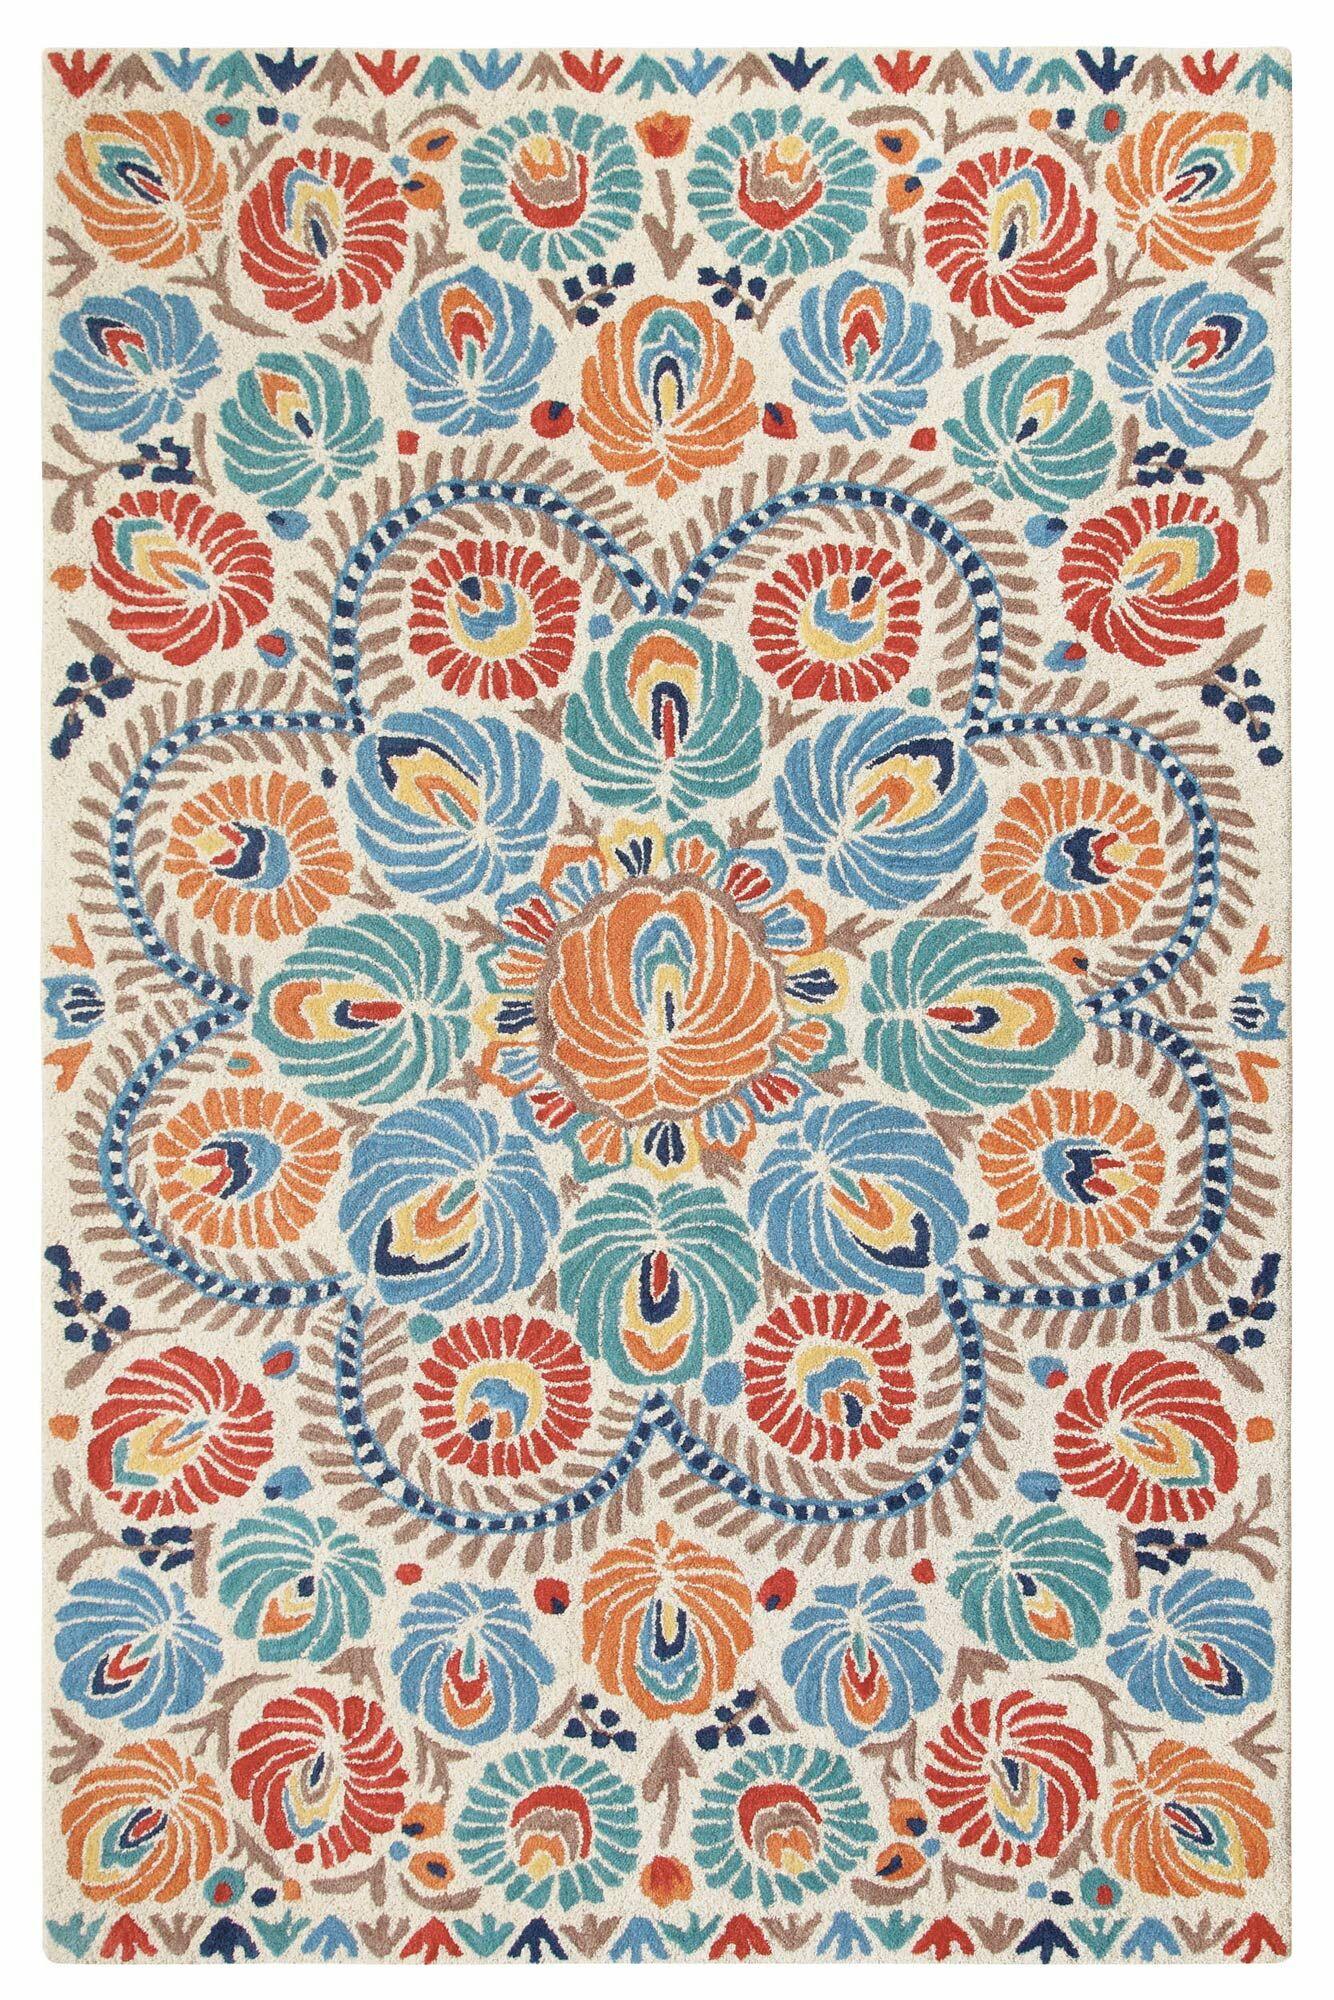 Matyo Hand Tufted Wool Cream/Blue Area Rug Rug Size: 5' x 8'